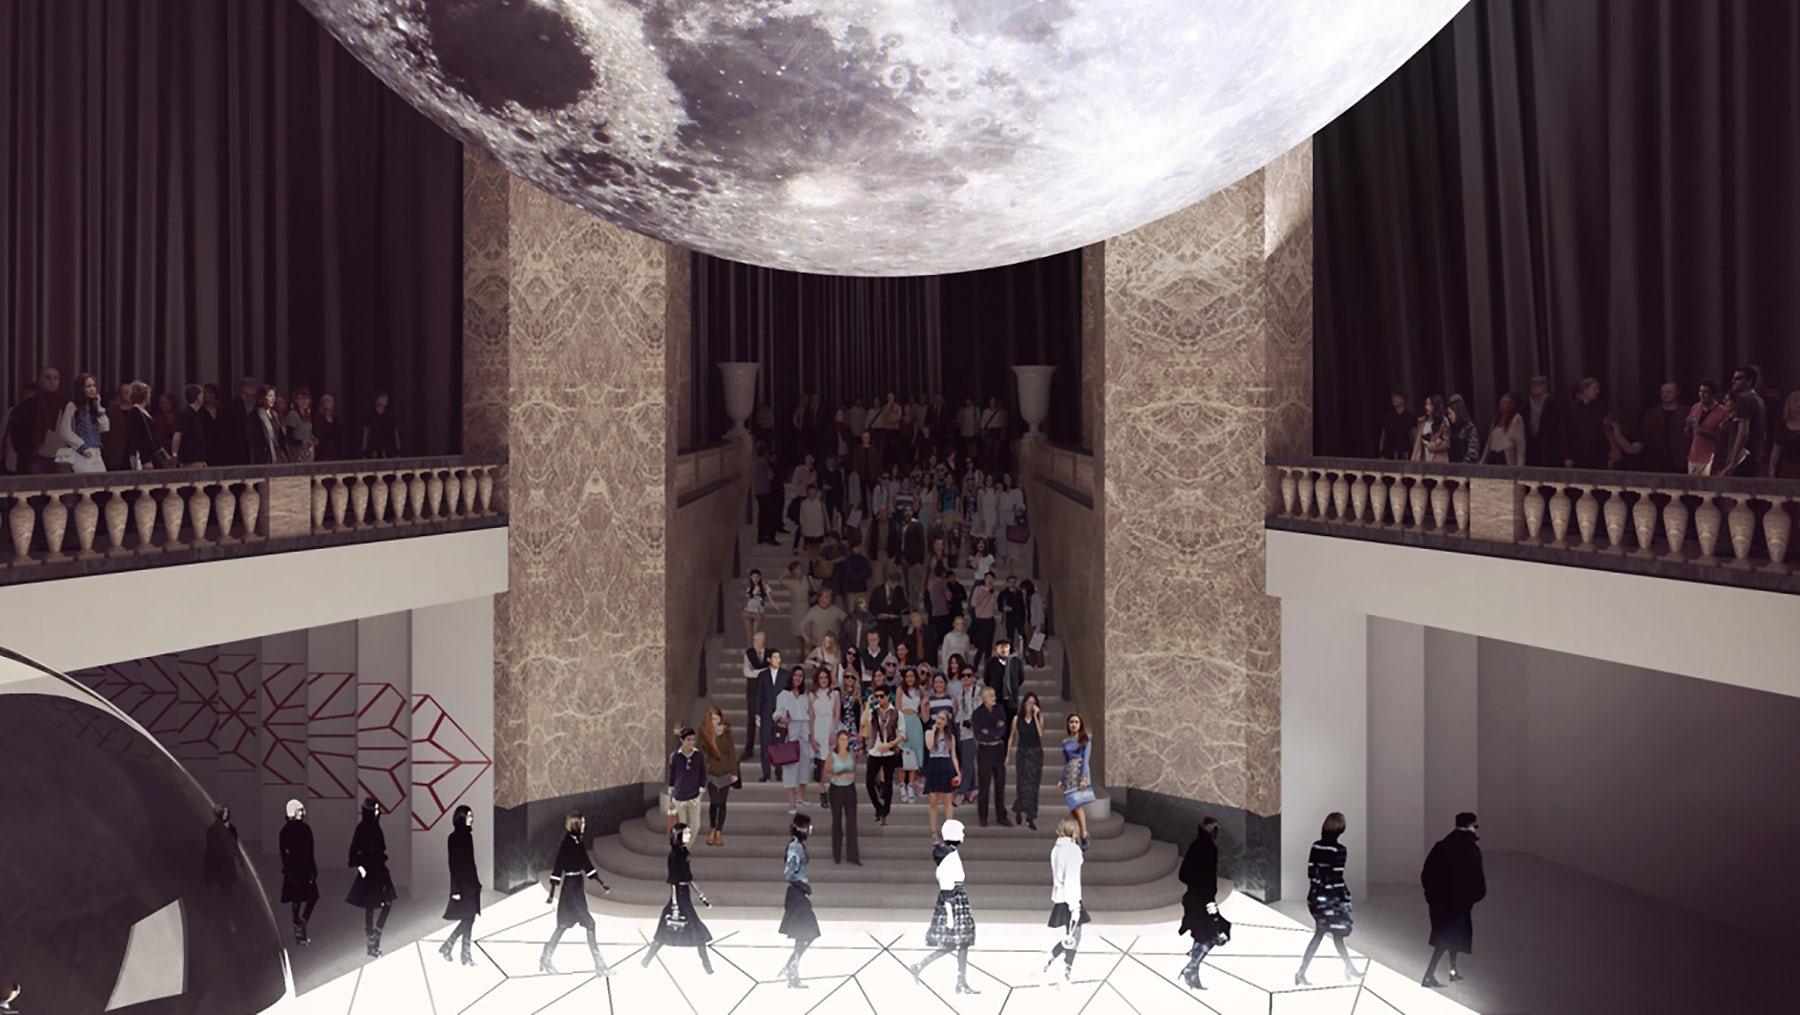 The inside of the future Galeries Lafayette Champs-Élysées | Source: Galeries Lafayette